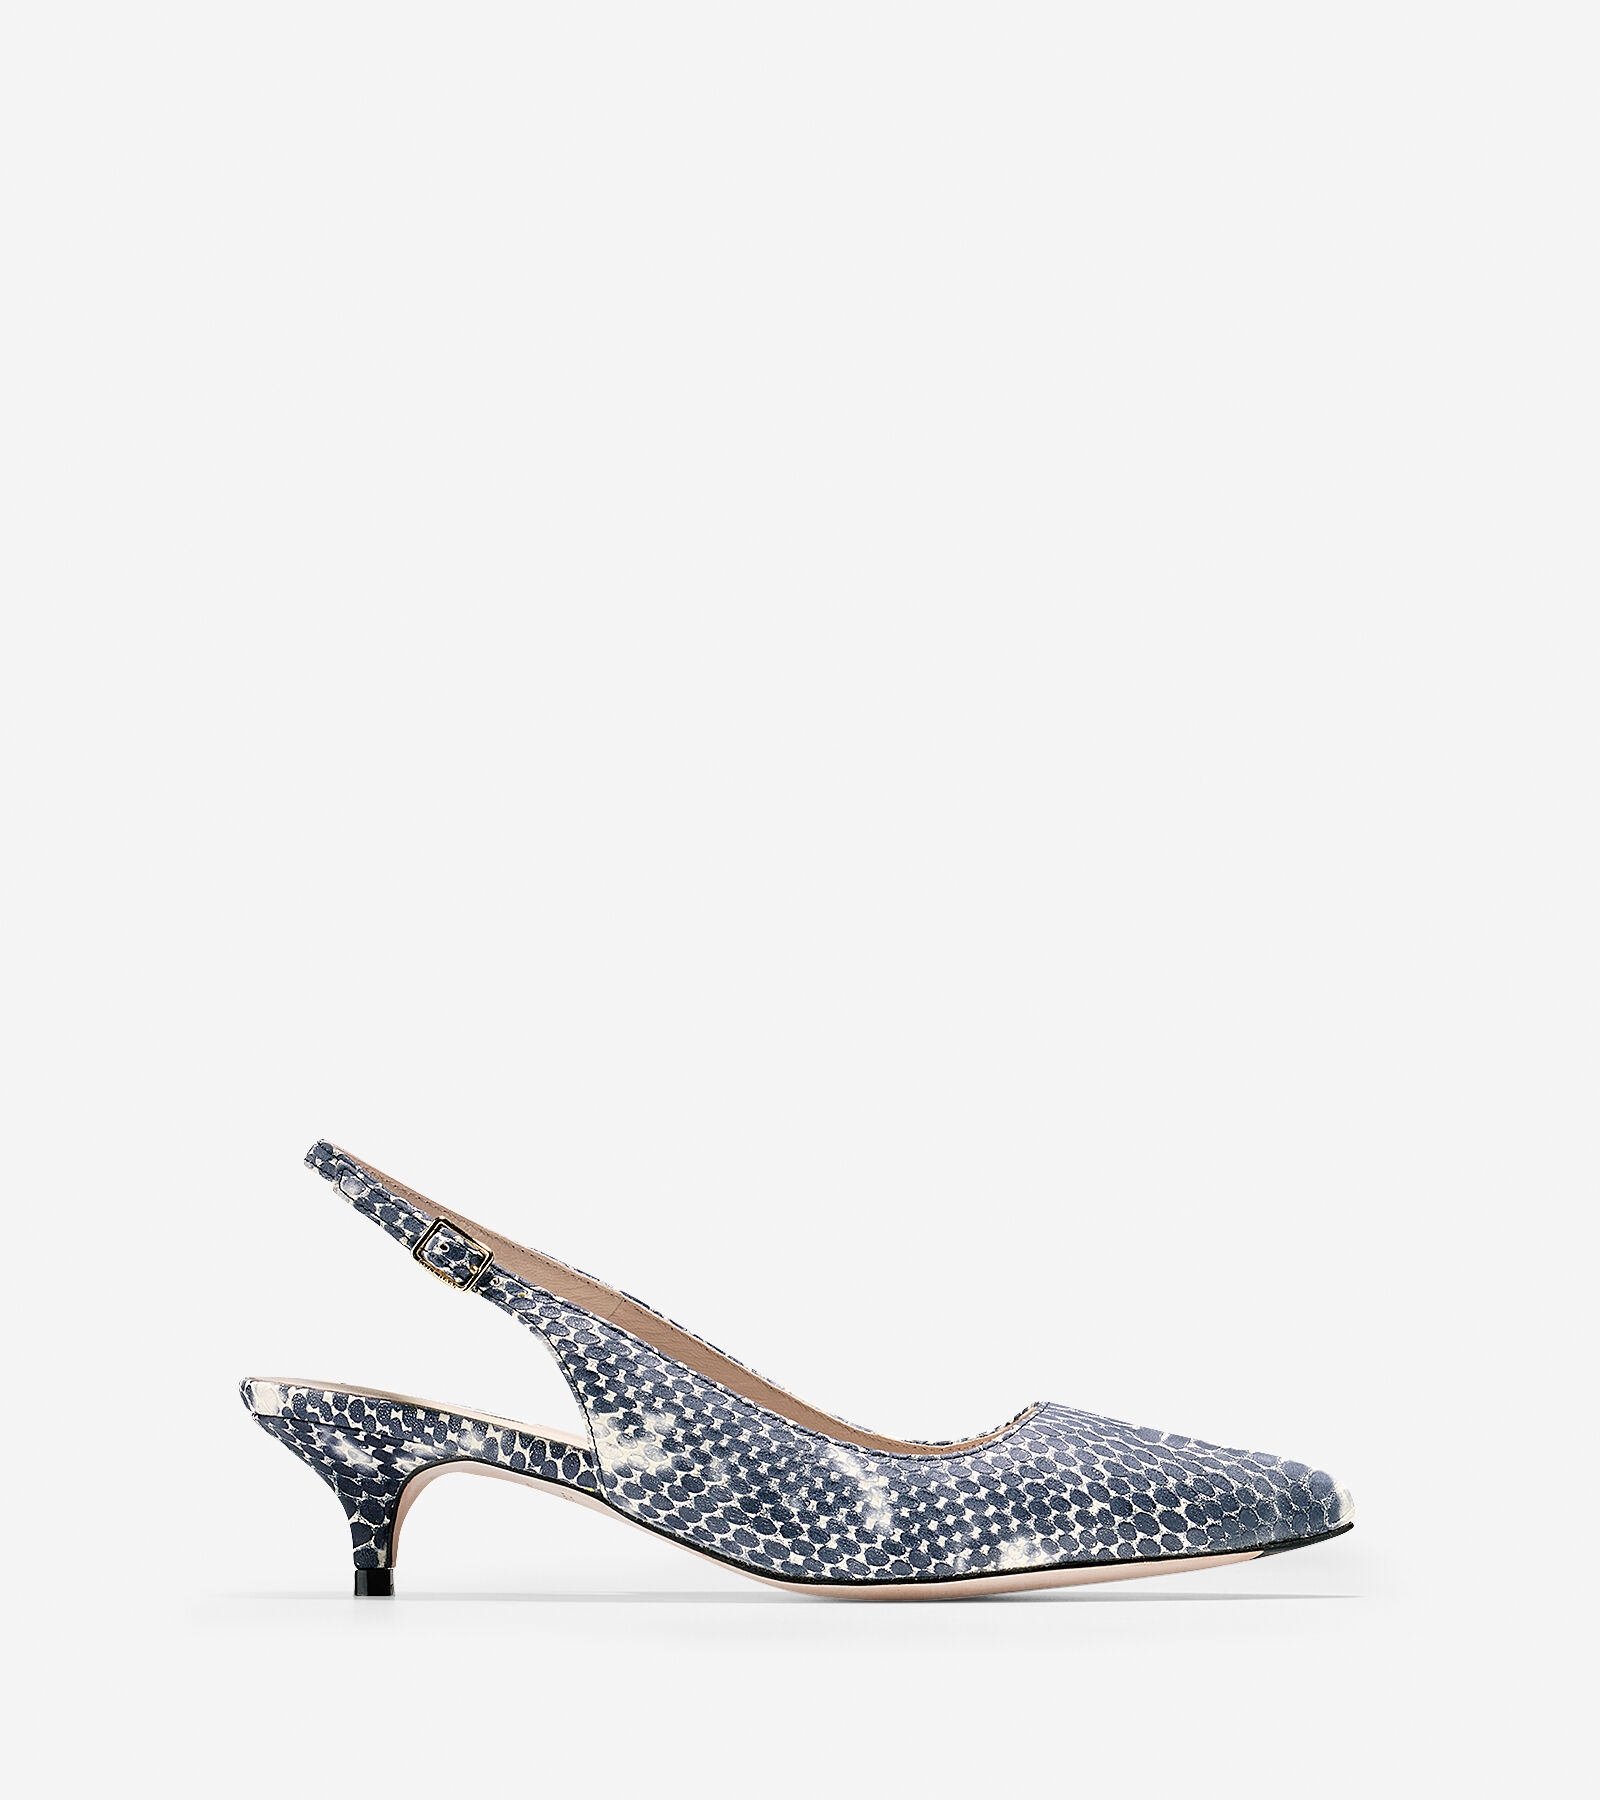 Womens Shoes Cole Haan Bradshaw Sling 40 Black/White Snake Print